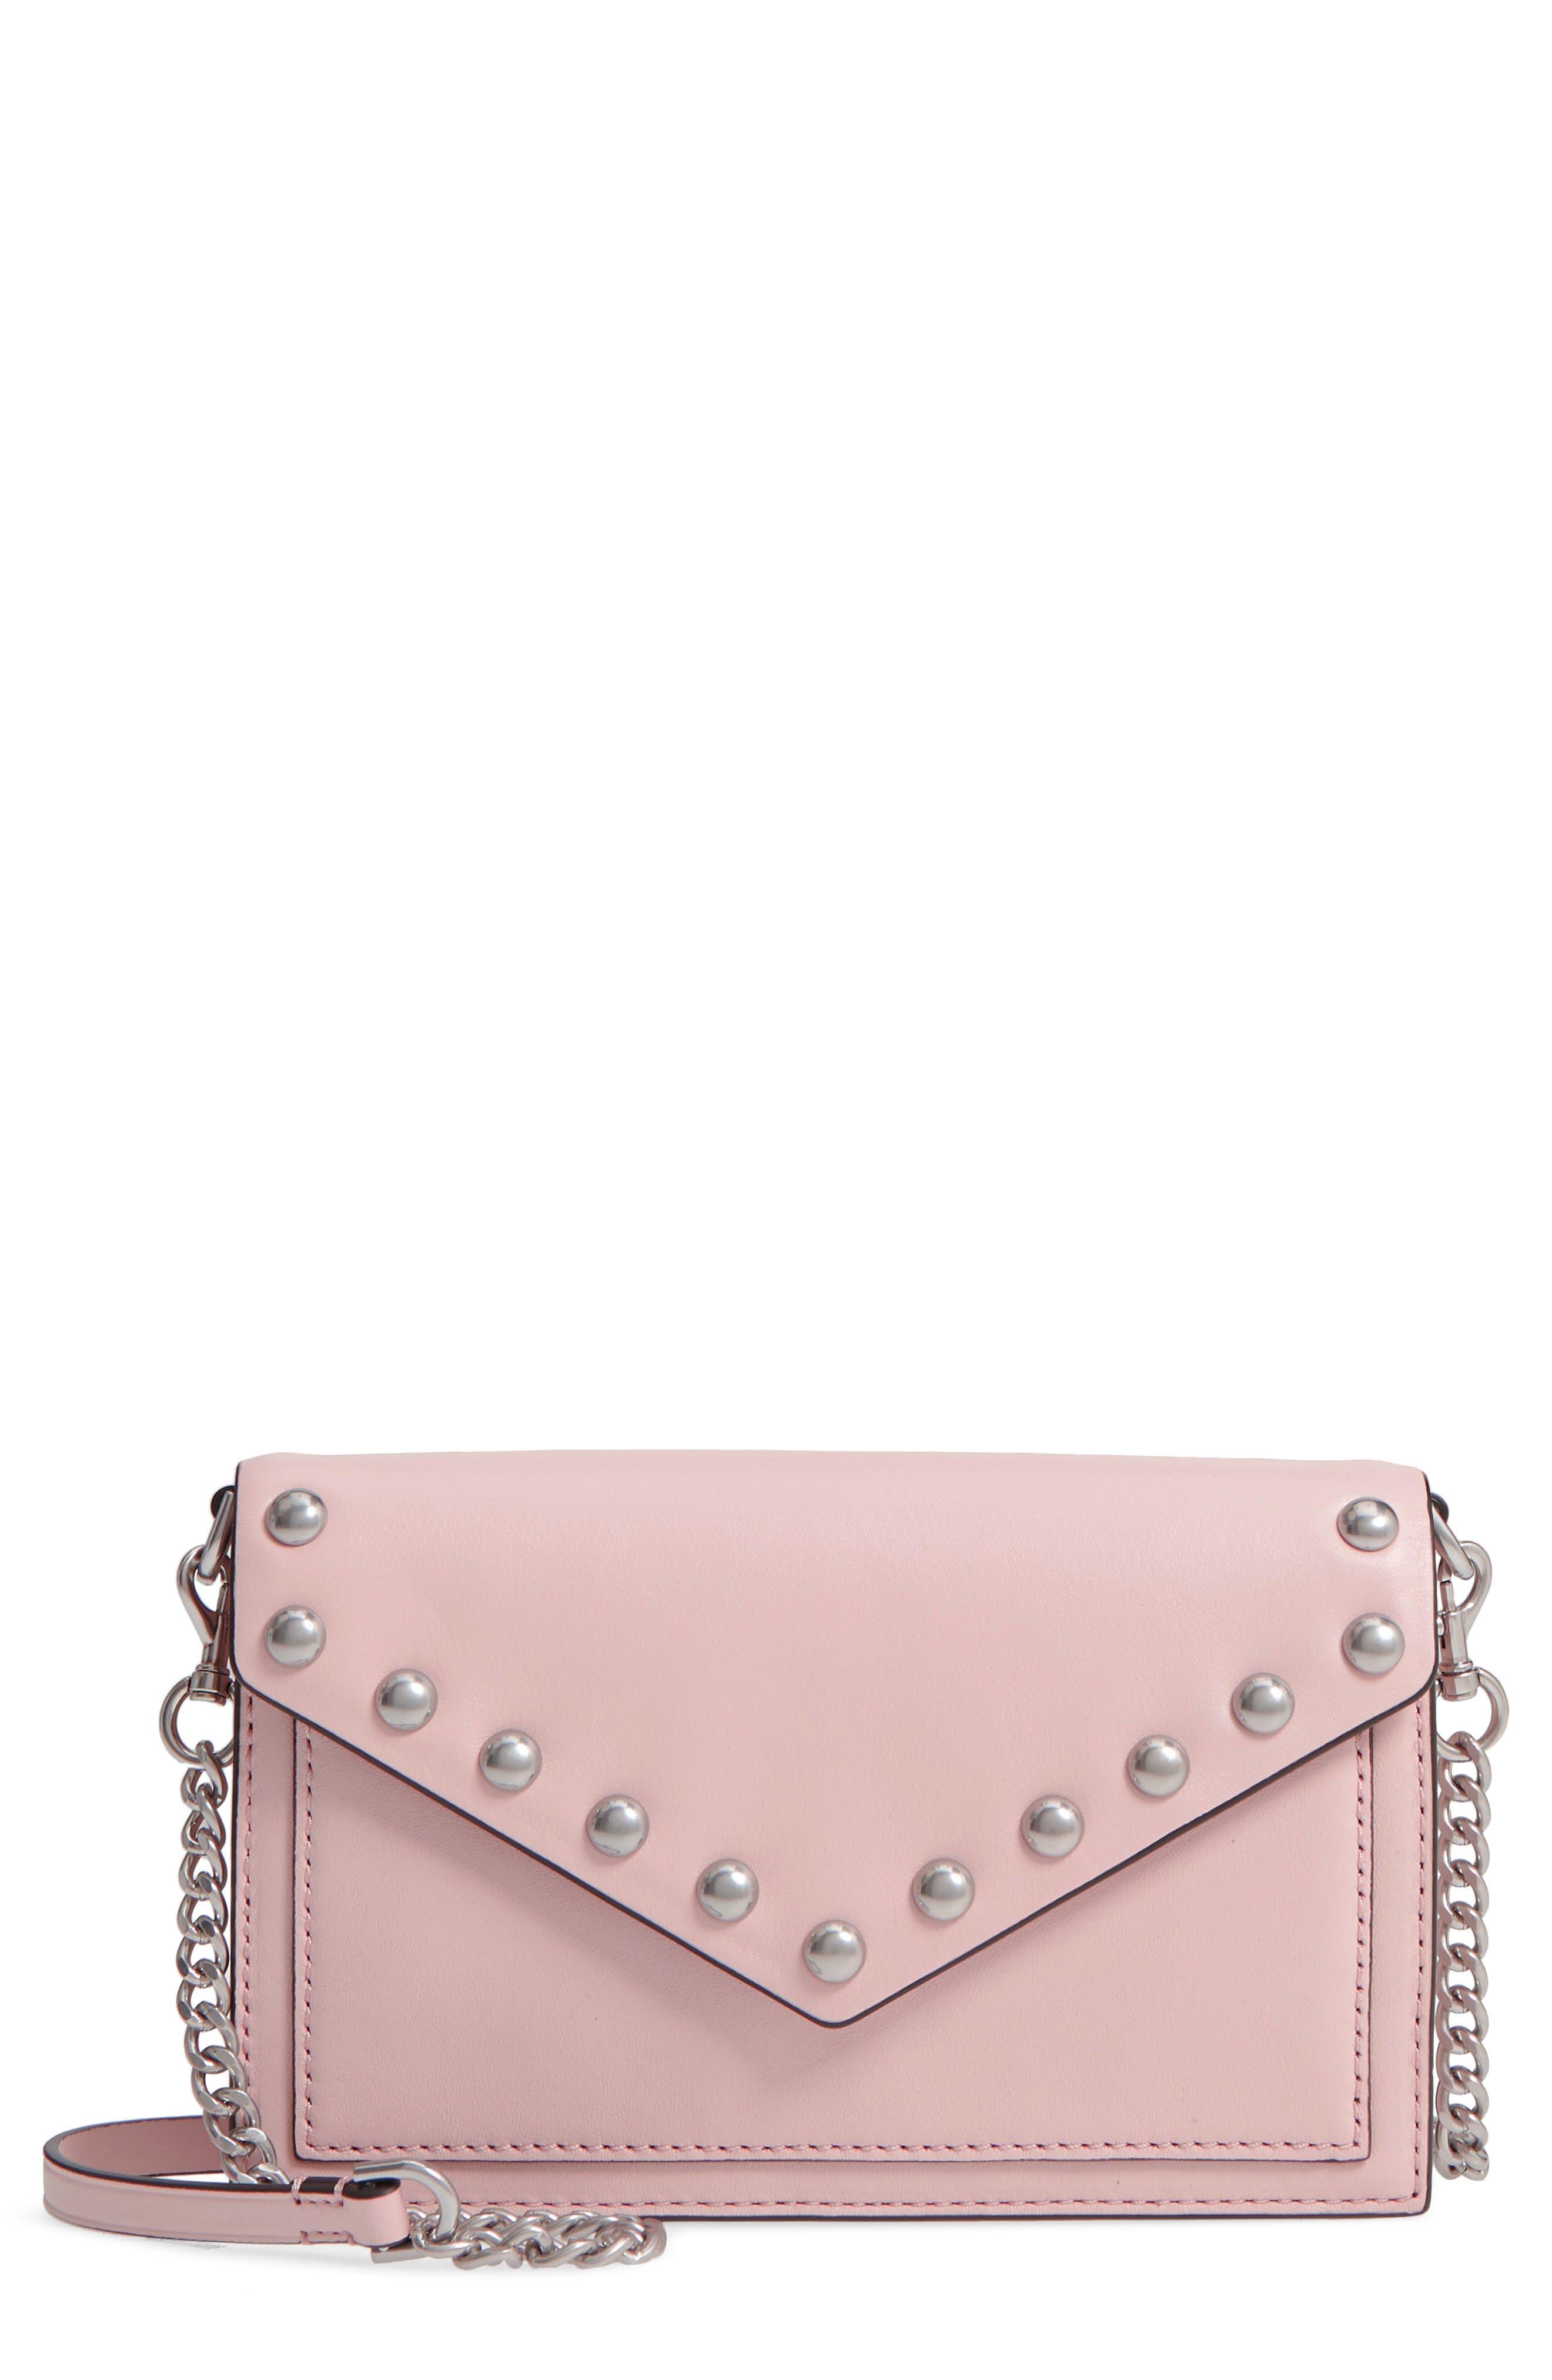 Blythe Studded Leather Crossbody Wallet,                             Main thumbnail 1, color,                             Peony